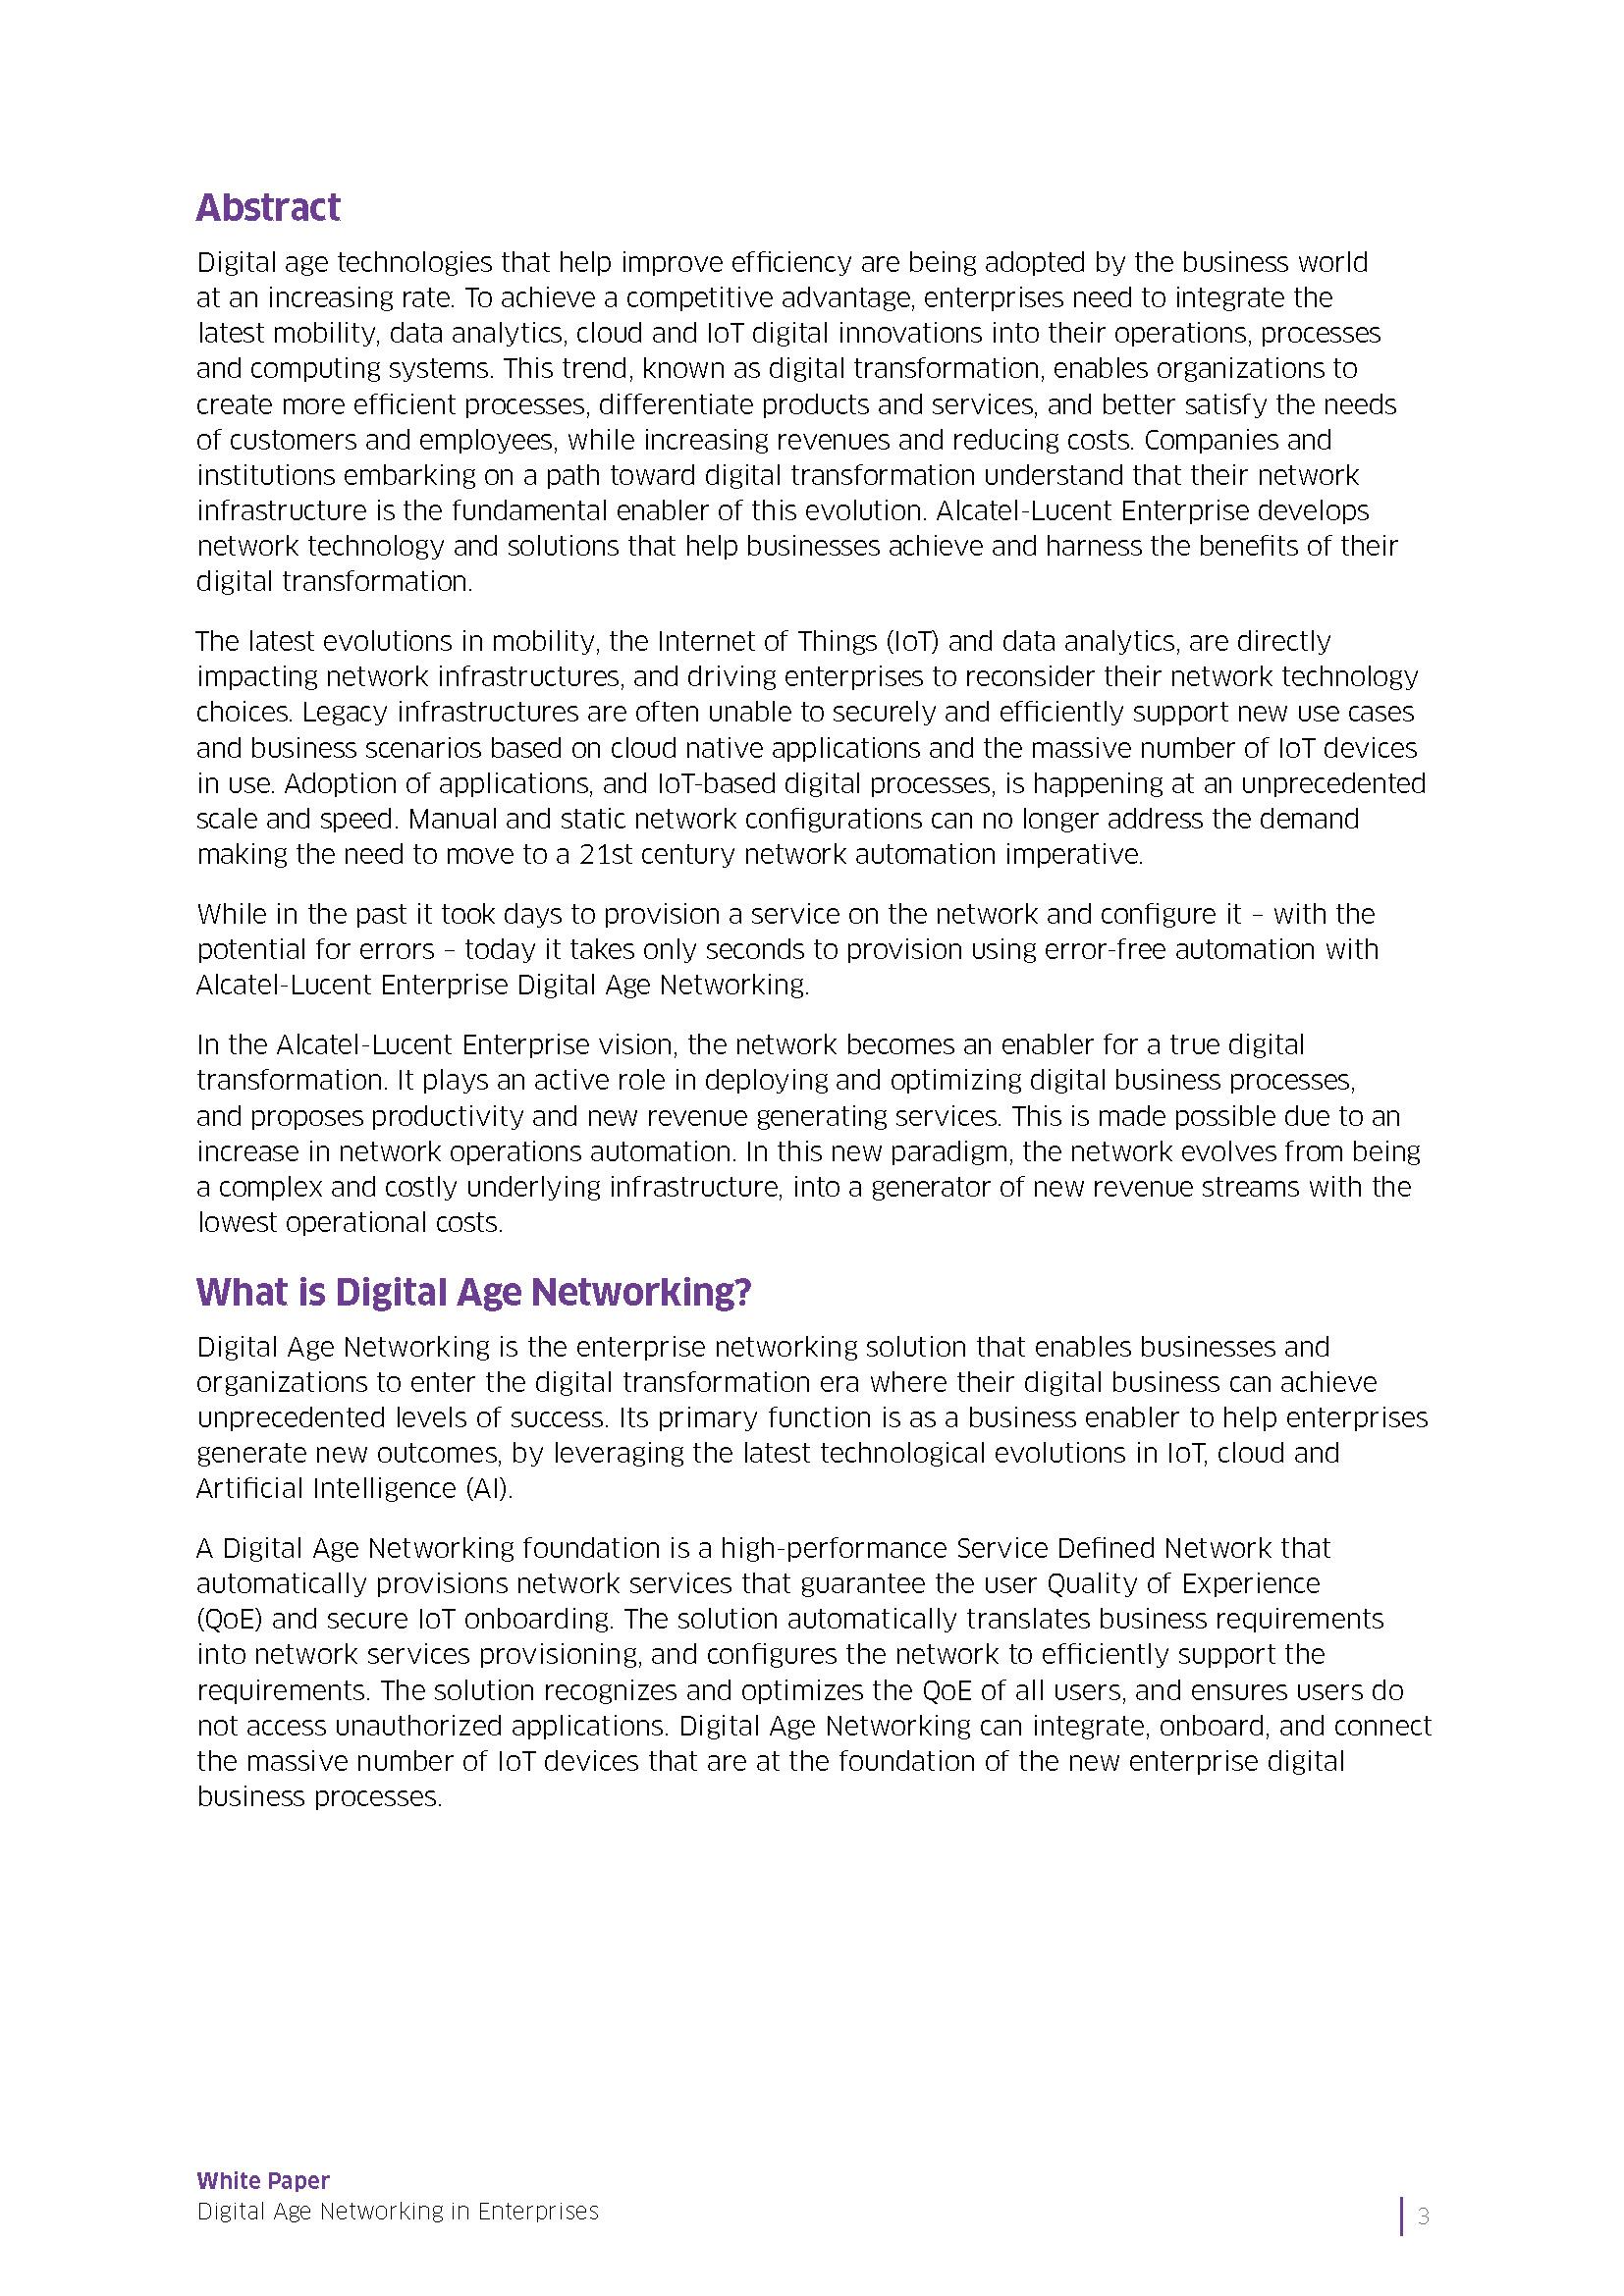 digital-age-networking-enterprises_Page_03